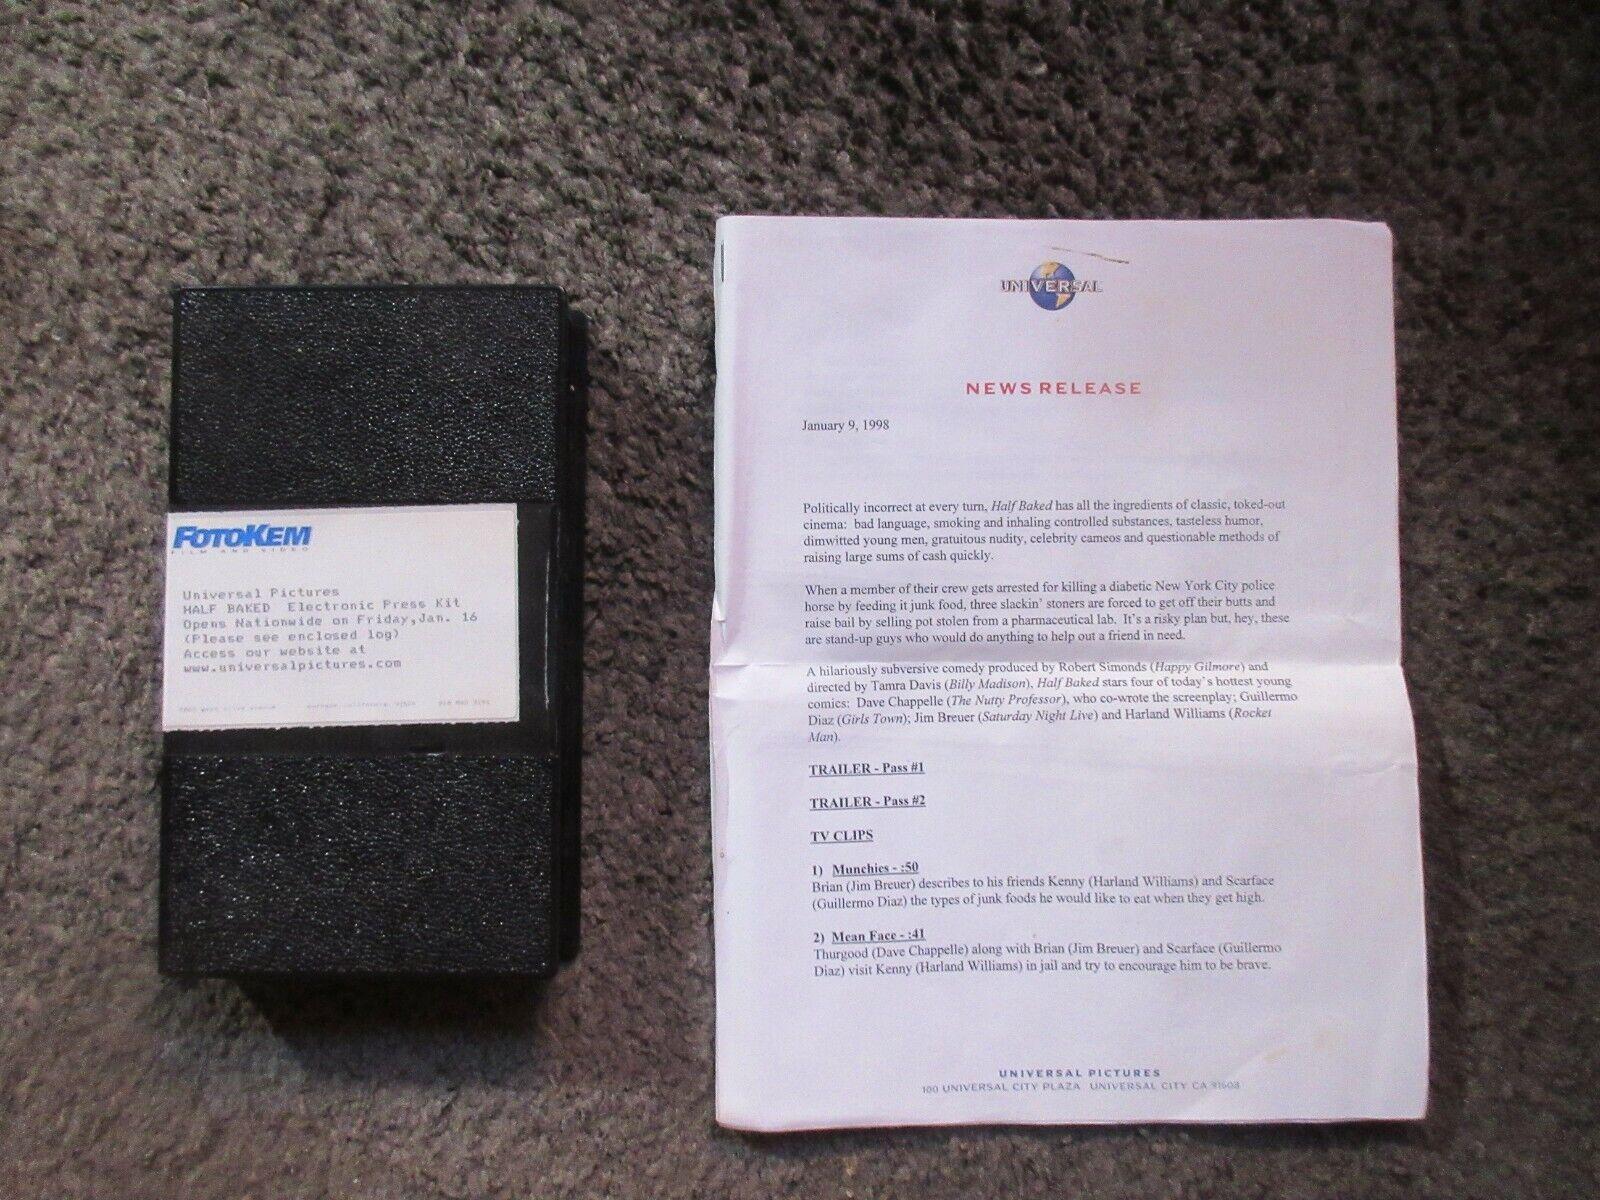 HALF BAKED STONER FILM DAVE CHAPPELLE 1998 UNIVERSAL RARE VHS EPK NOTES - $5.99